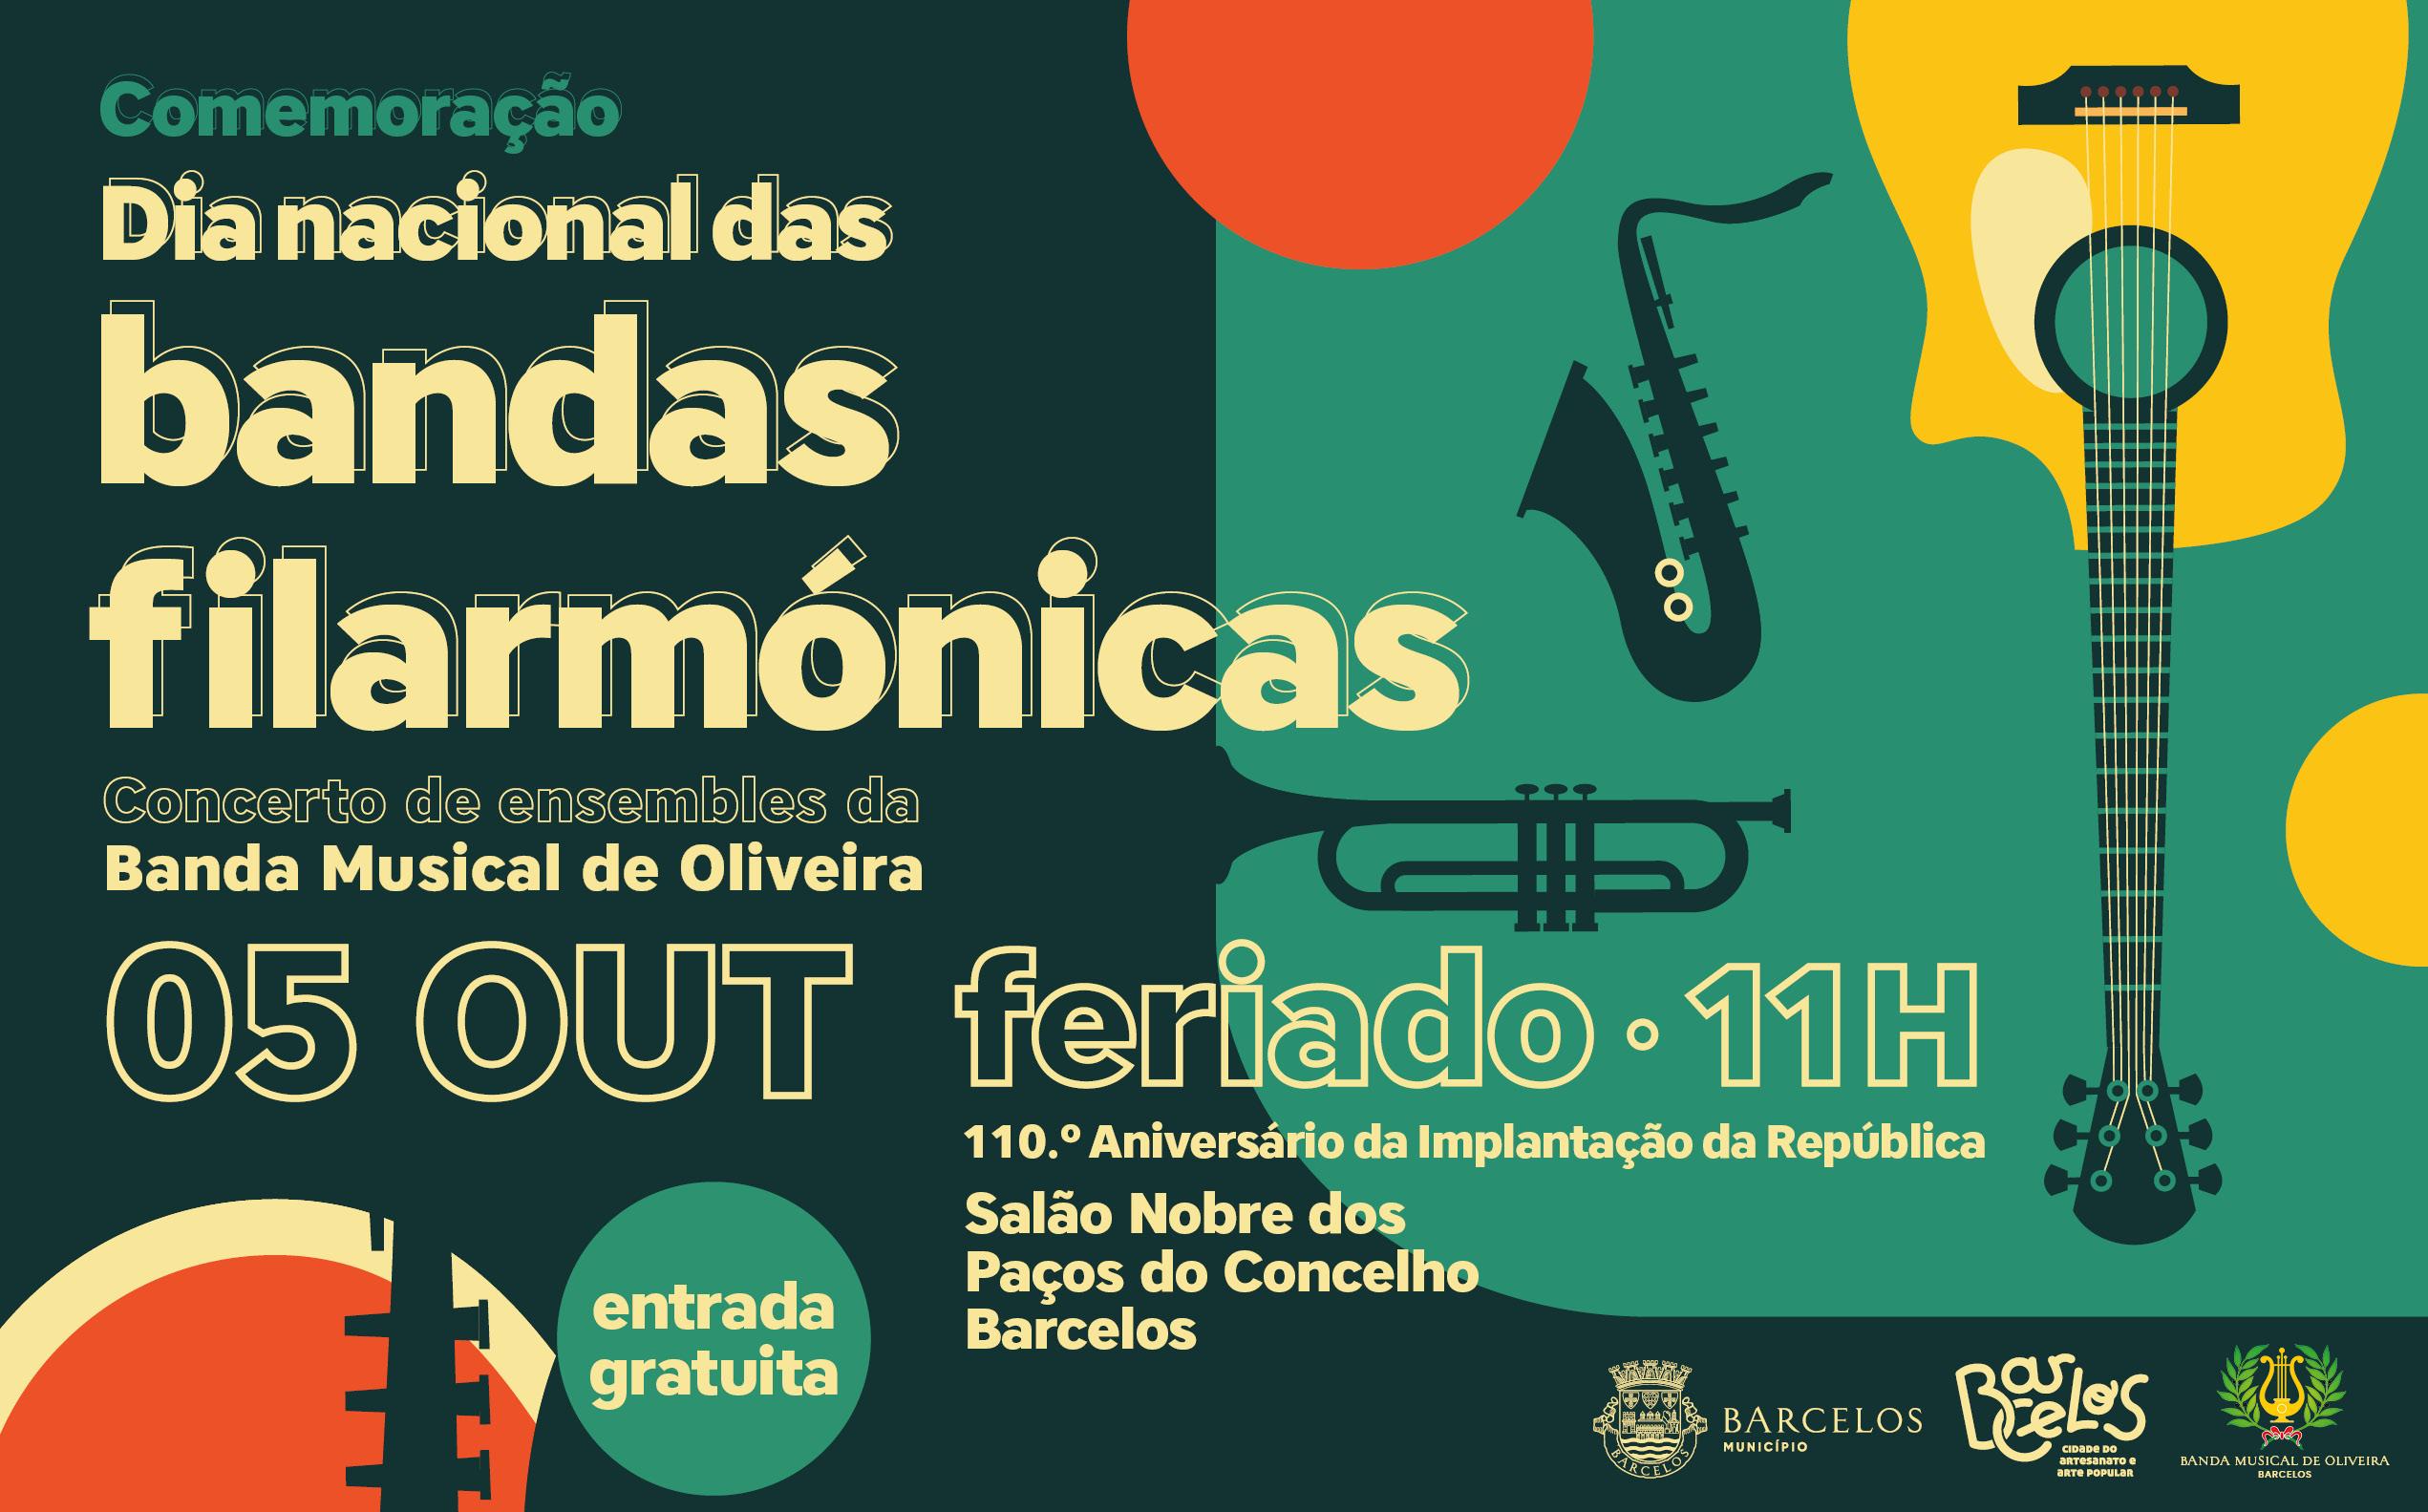 Barcelos comemora Dia Nacional das Bandas Filarmónicas